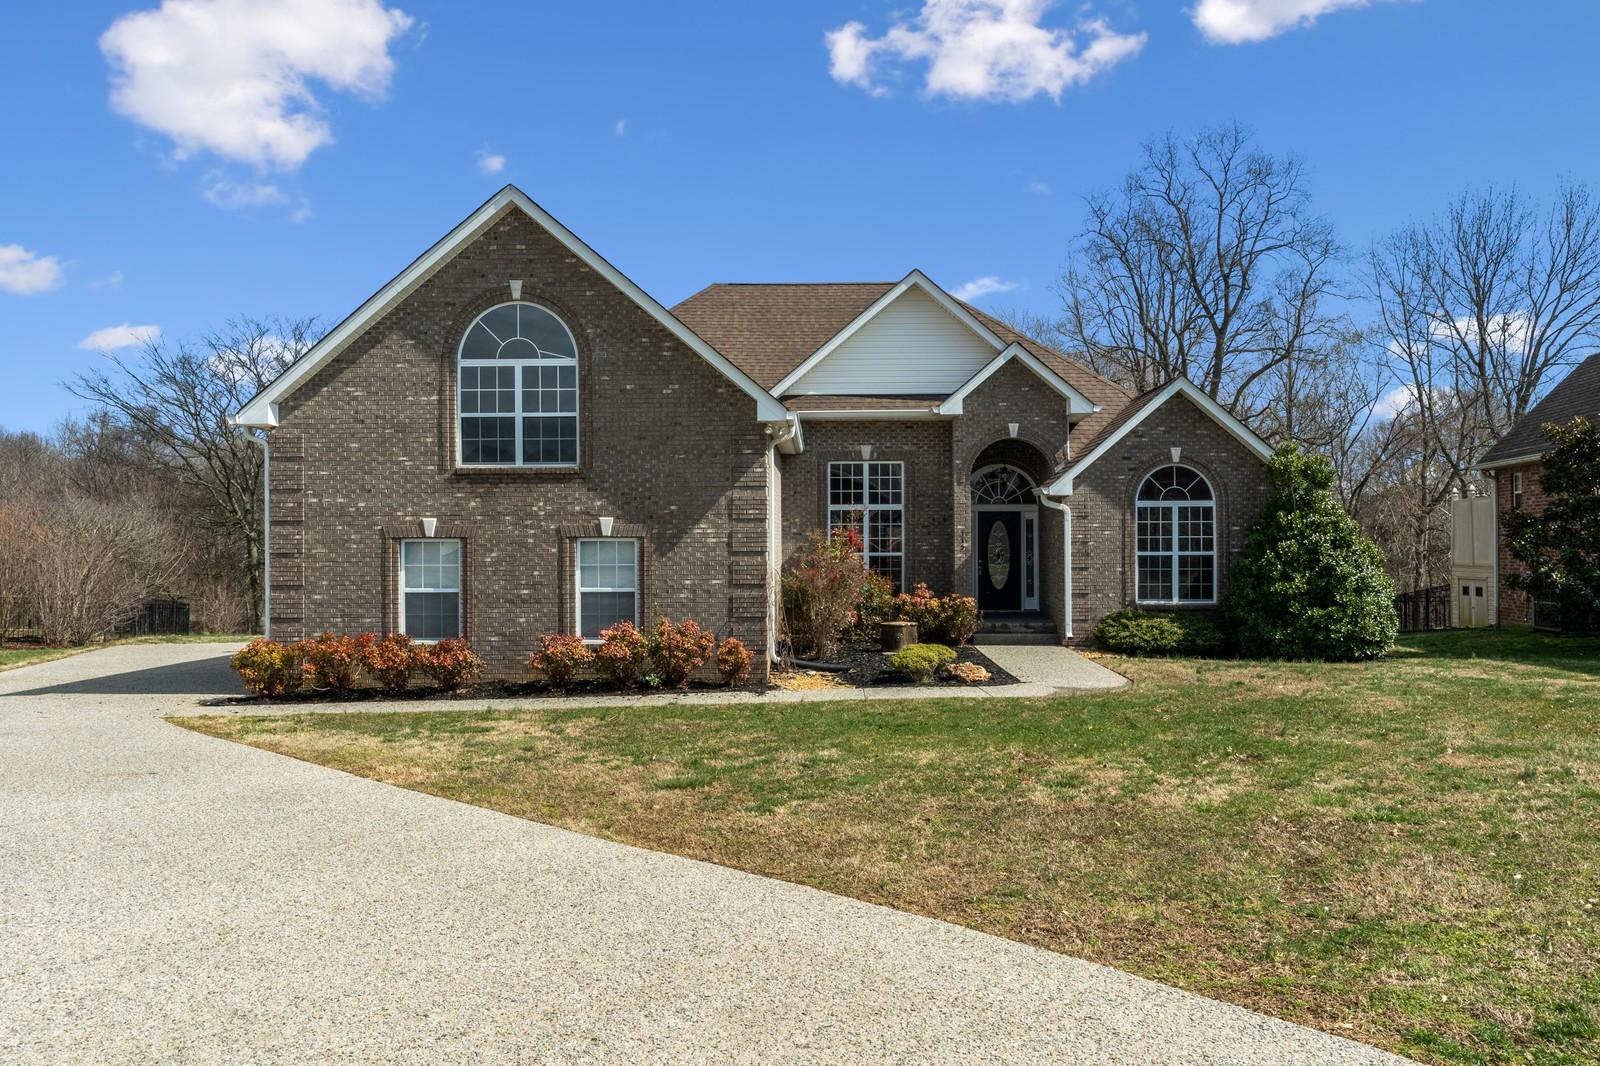 115 Brigham Ct, White House, TN 37188 - White House, TN real estate listing